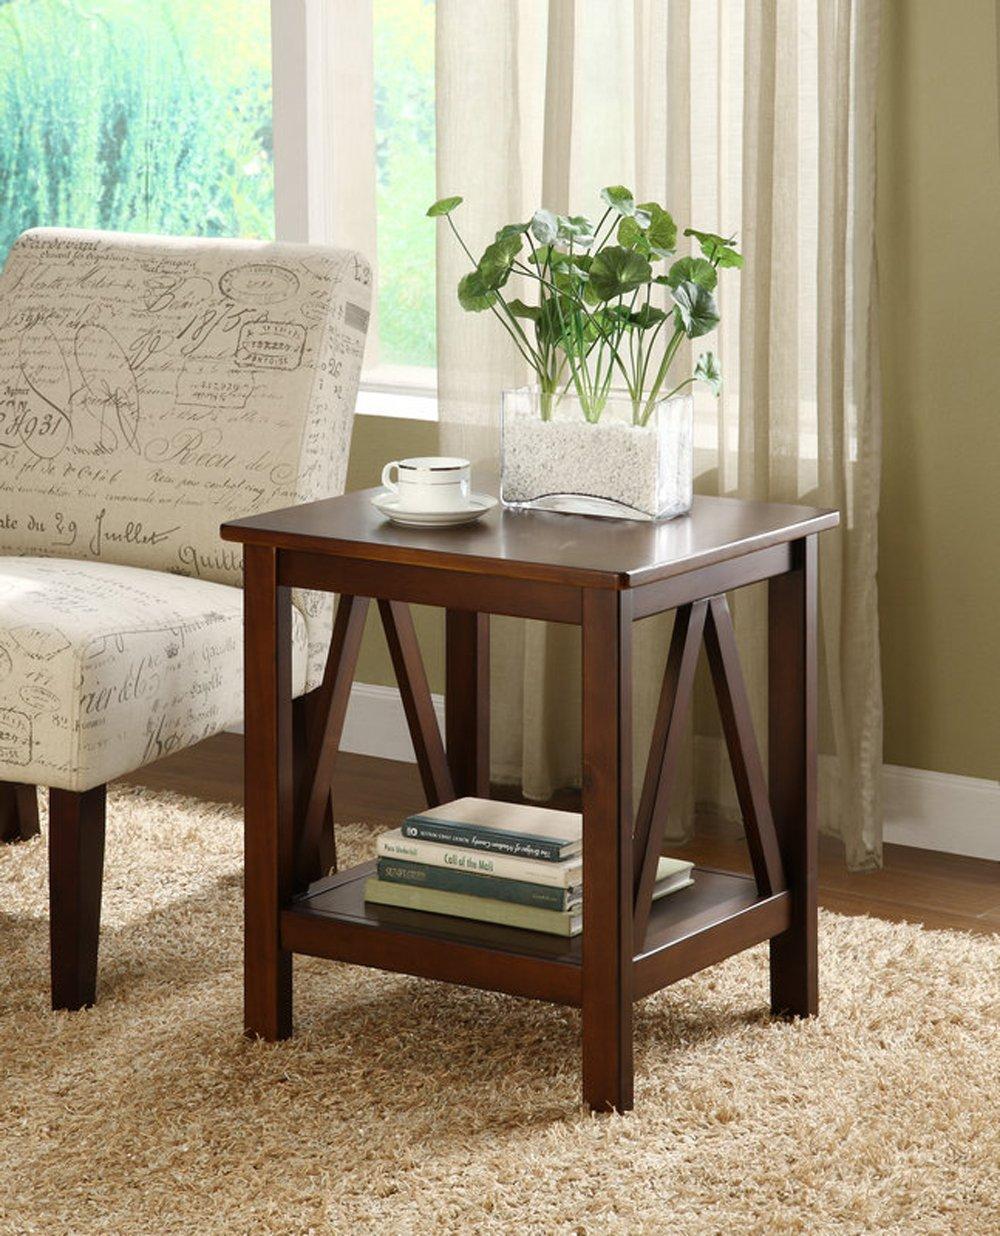 Amazon.com: Linon Home Decor Titian Antique End Table: Kitchen U0026 Dining